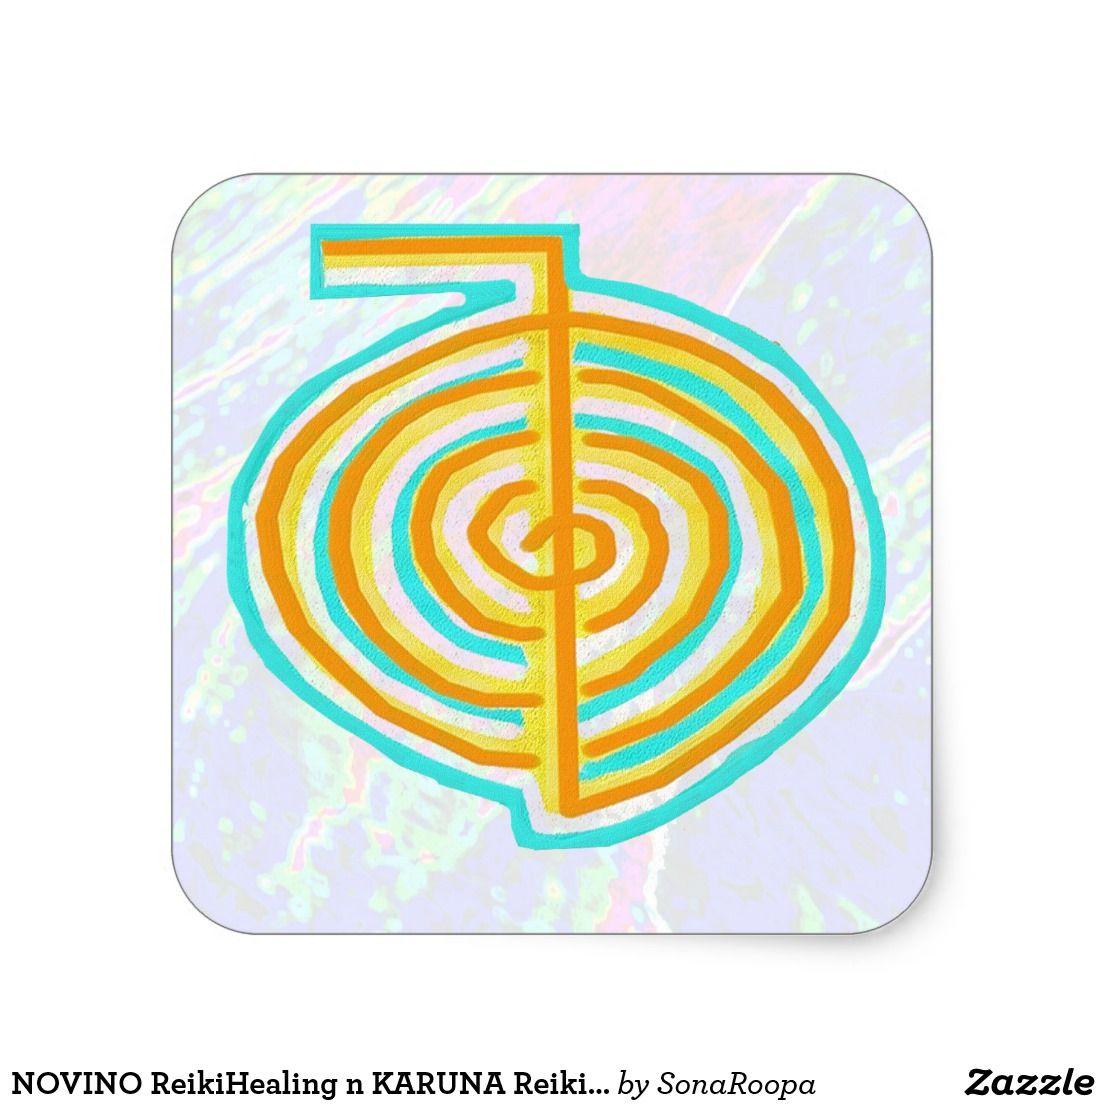 Novino reikihealing n karuna reiki symbols square sticker 101 novino reikihealing n karuna reiki symbols square sticker buycottarizona